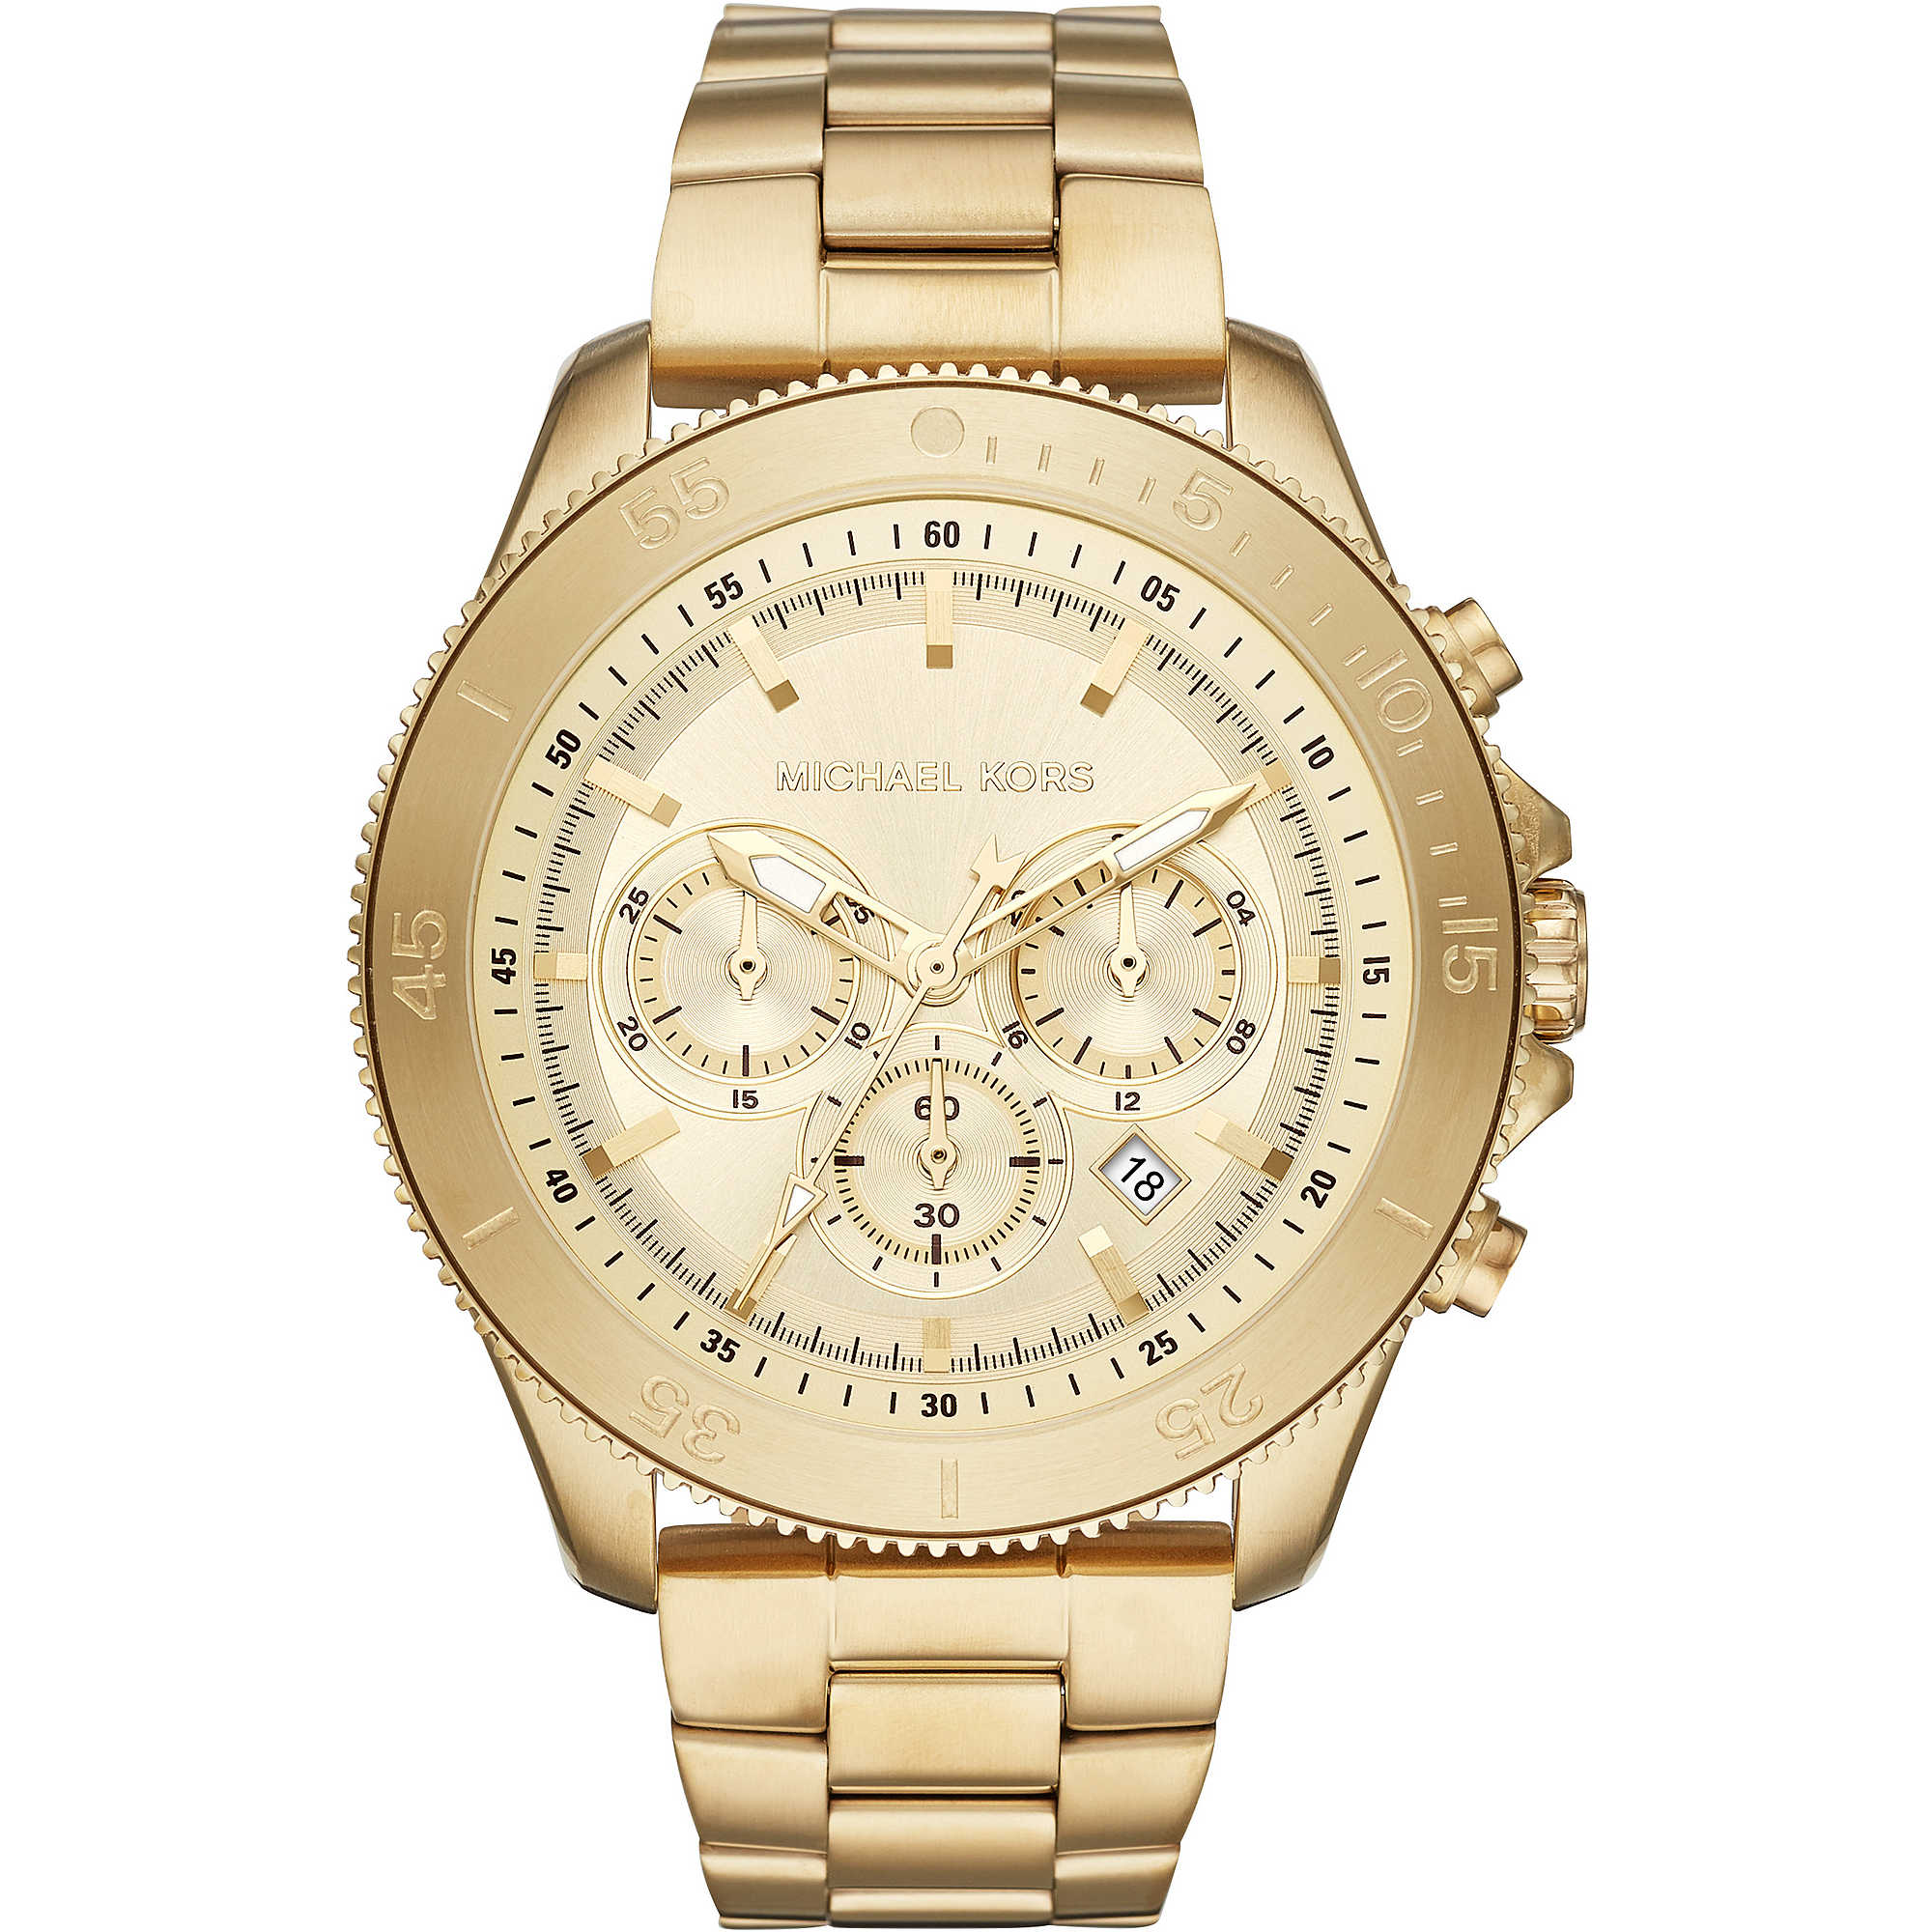 cc5d1be5835ef watch chronograph man Michael Kors Theroux MK8663 chronographs ...